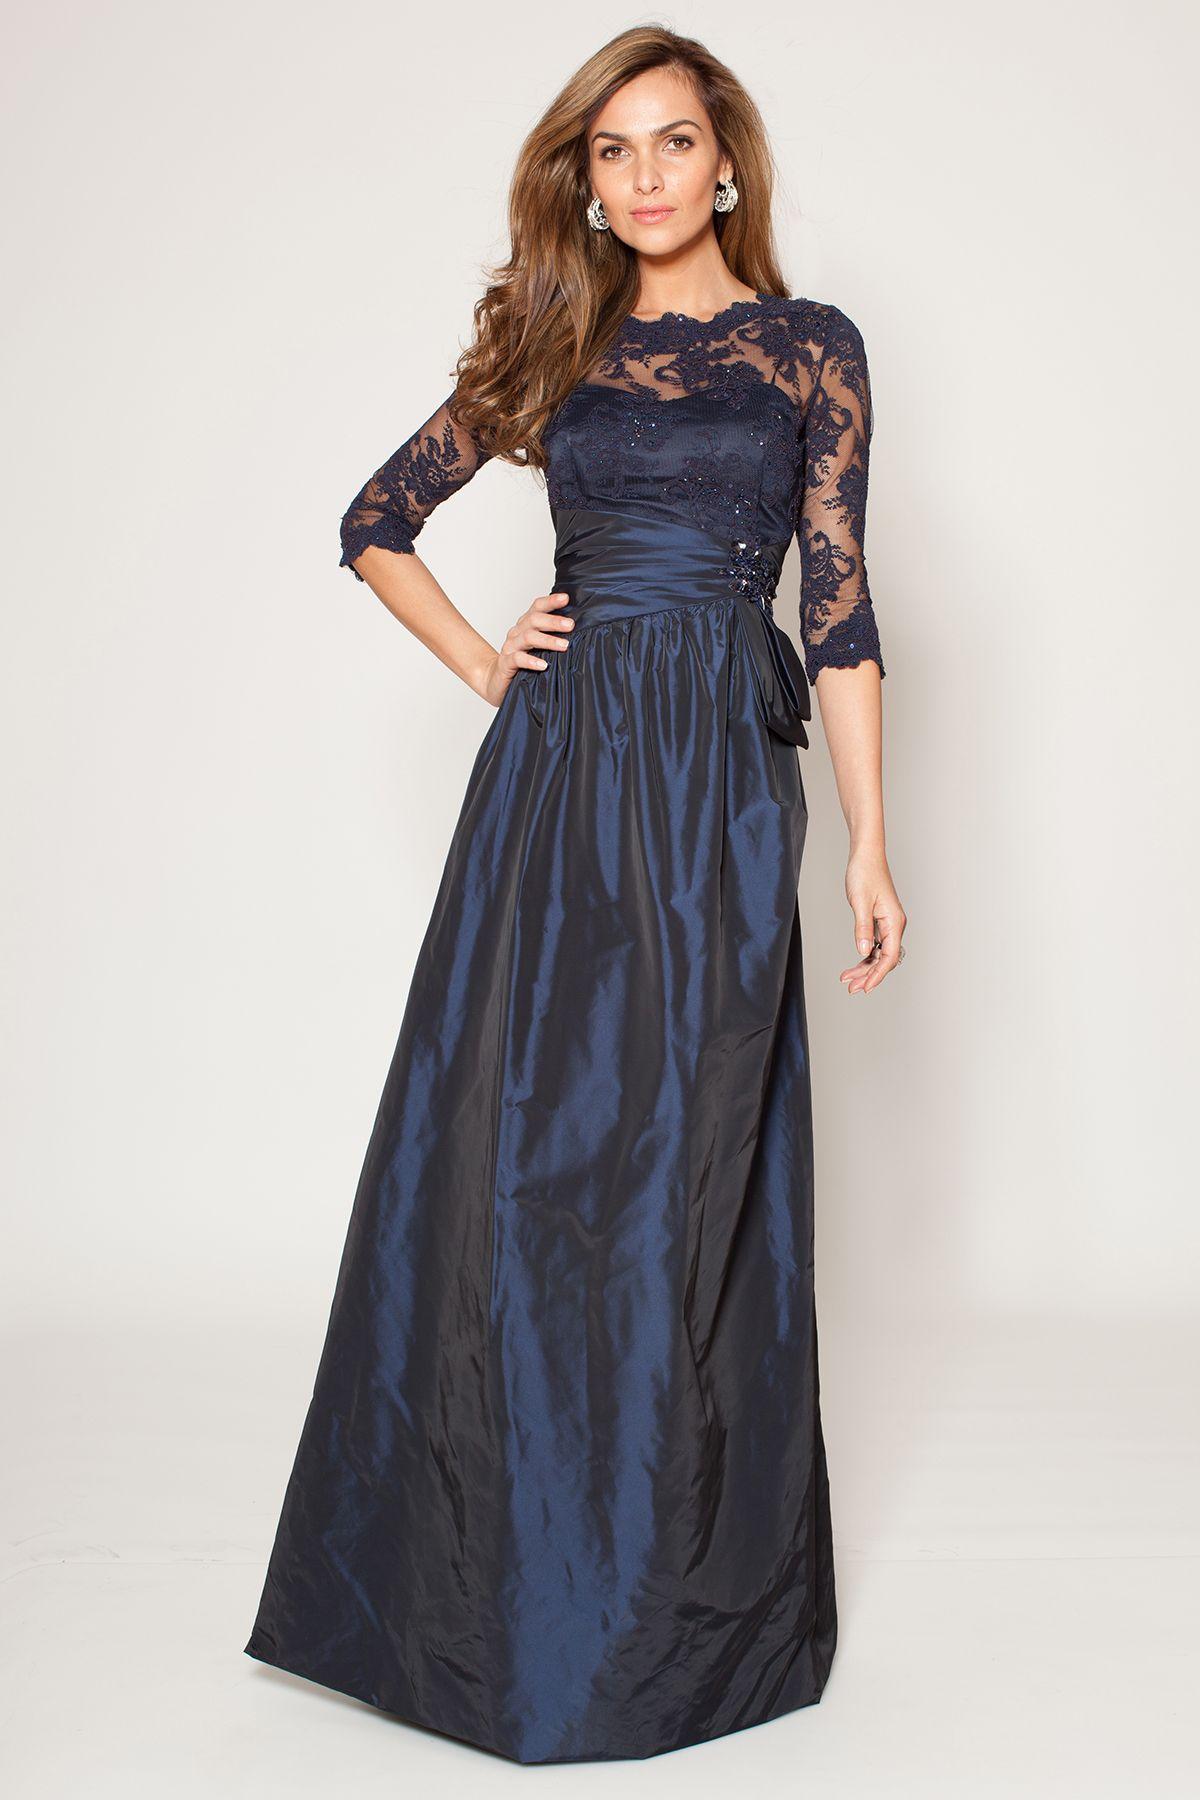 Teri Jon Long Sleeve Lace and Taffeta Gown   Teri Jon   dresses ...